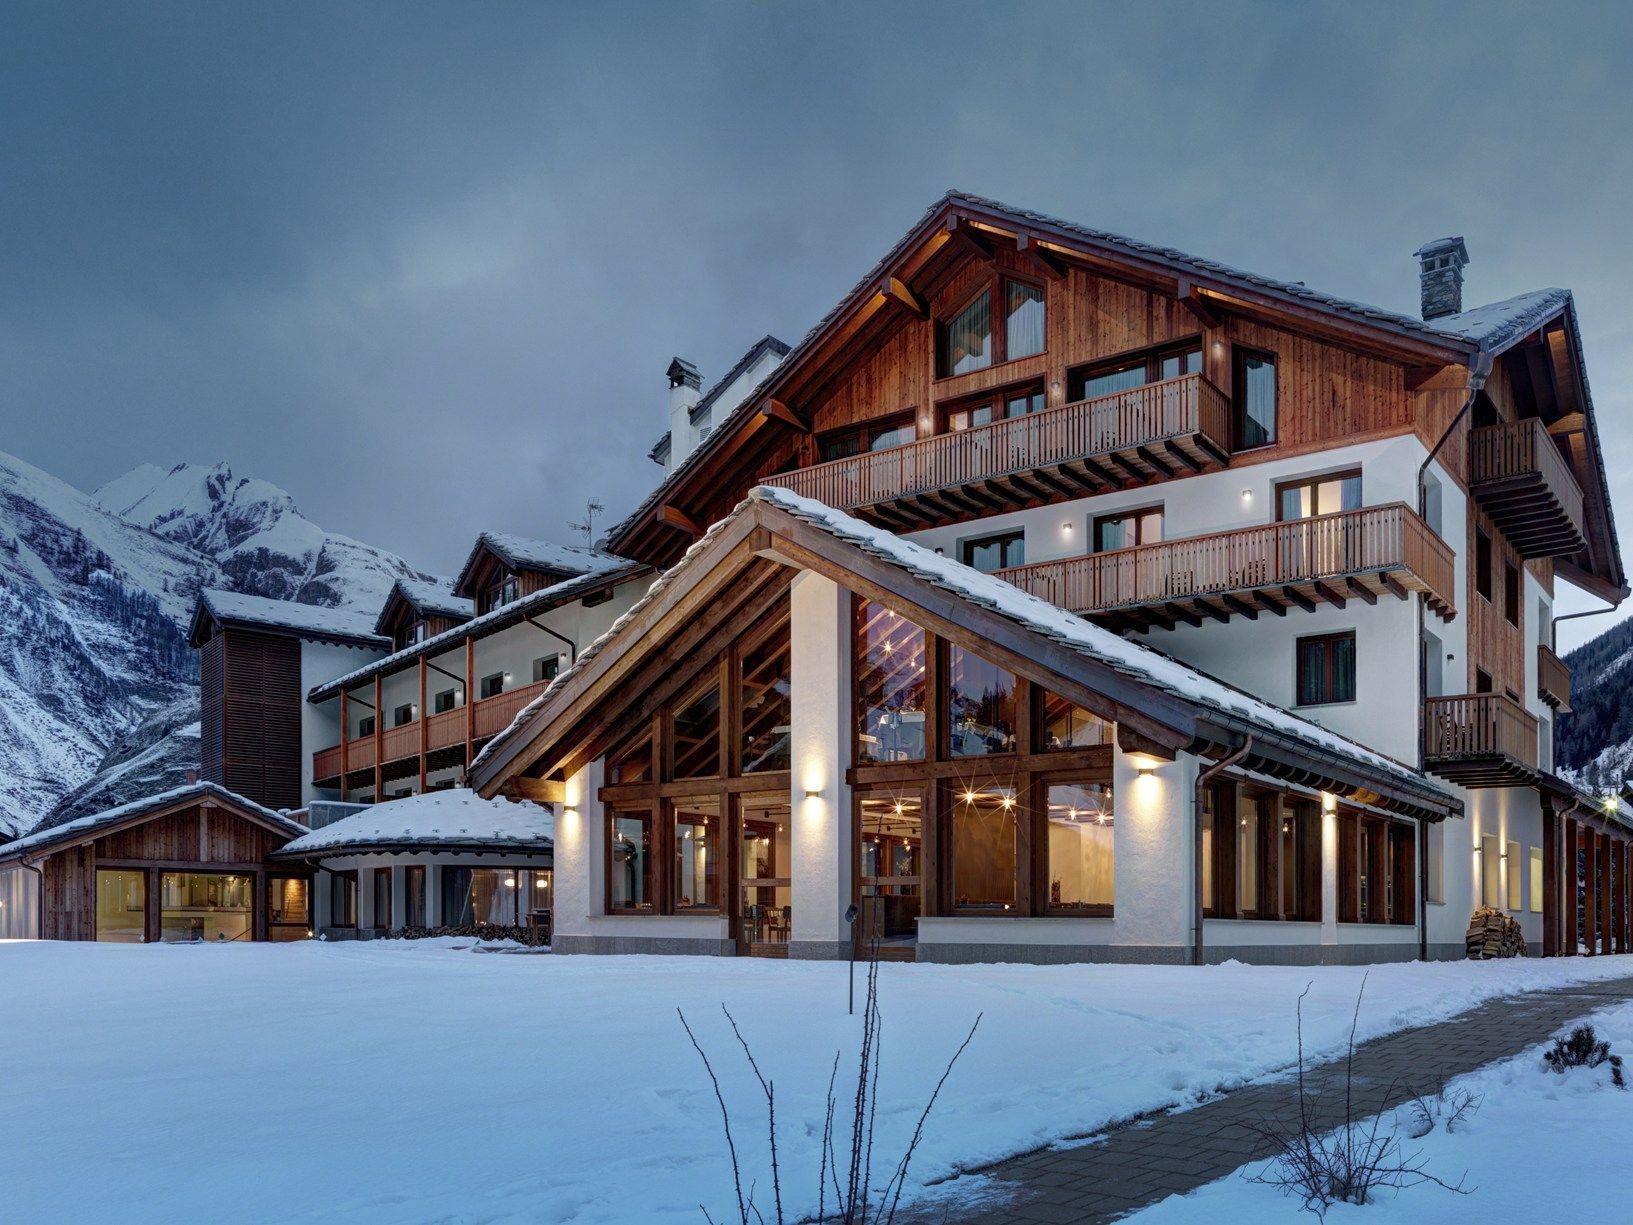 Nardi arreda i terrazzi dell 39 hotel nira montana in valle d for Design hotel valle d aosta